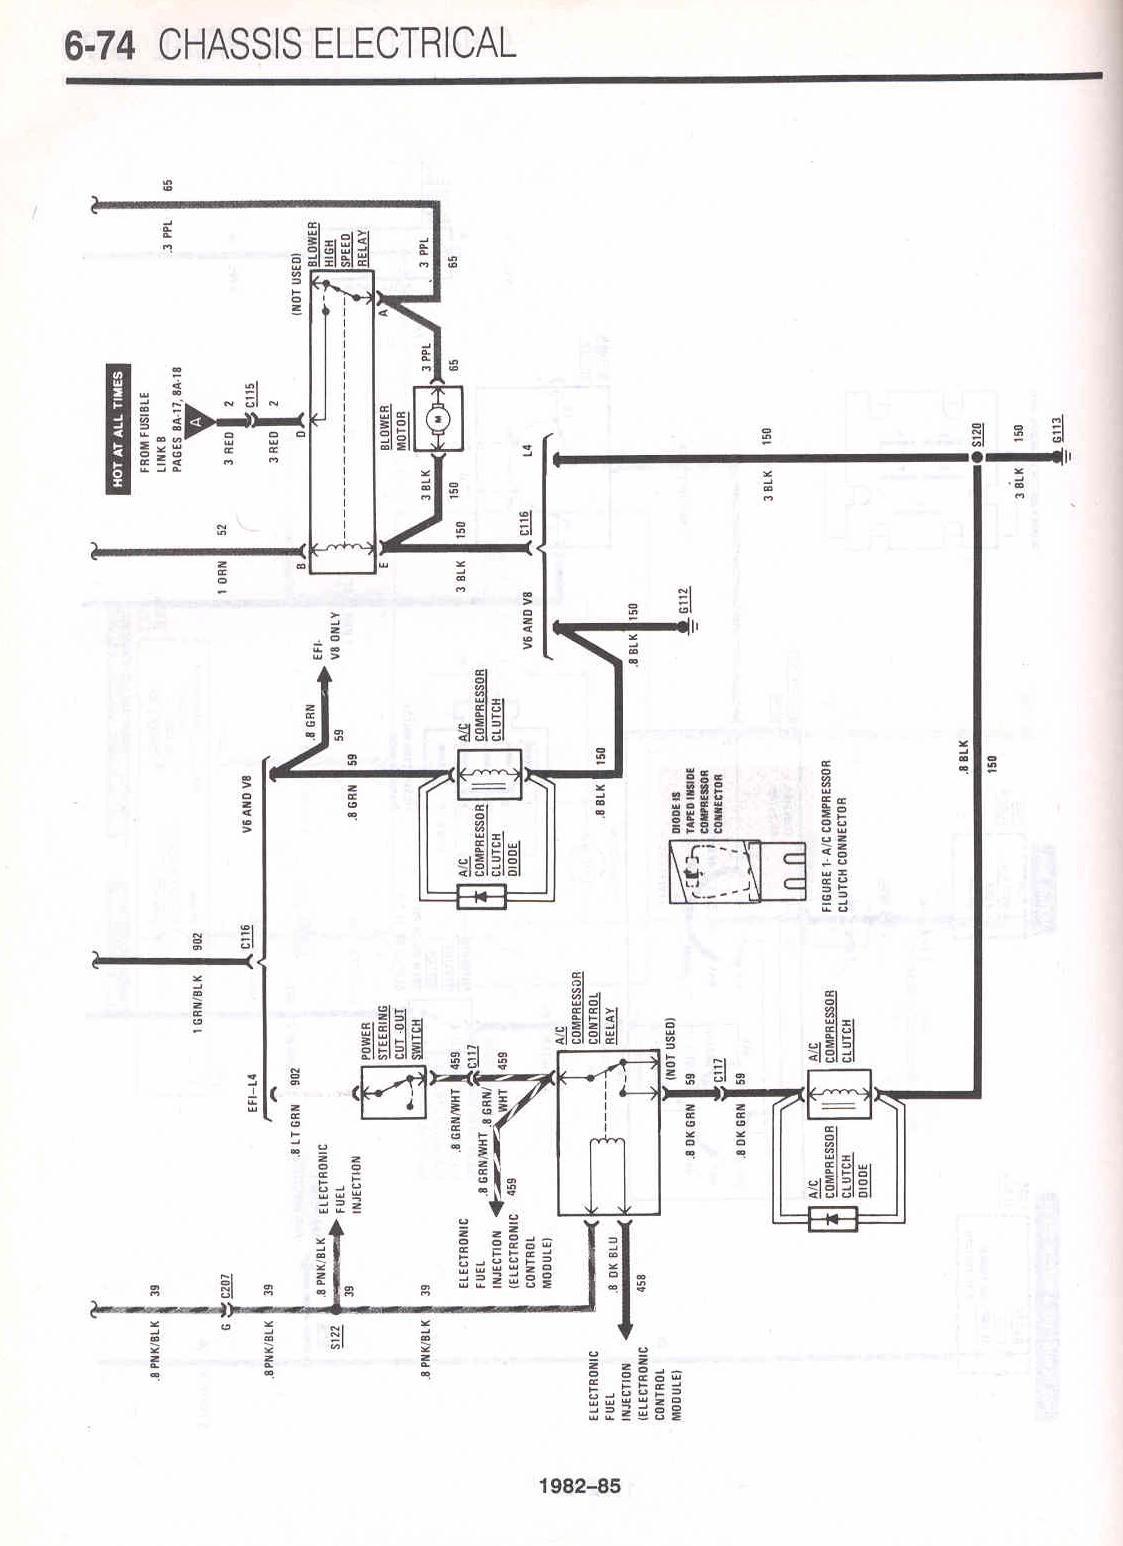 84 camaro radio wiring diagram car info 2010 camaro radio wiring diagram #10